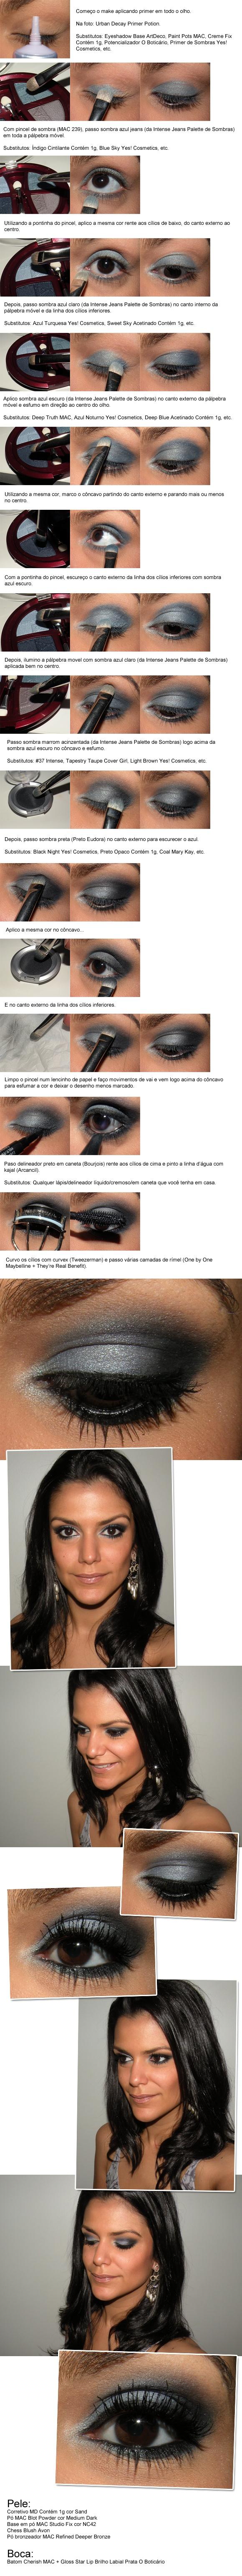 makeup by Marina Smith